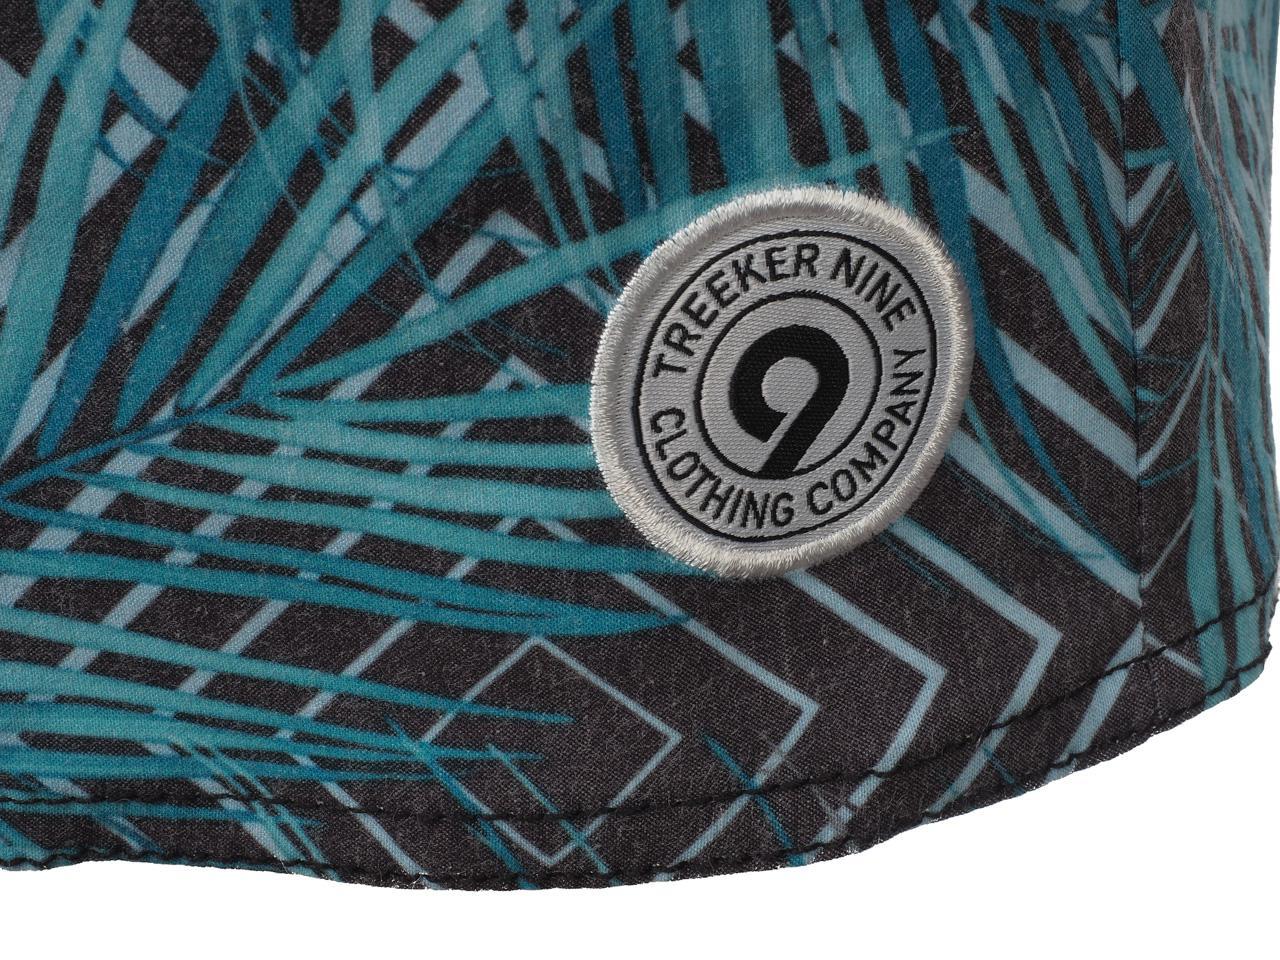 Swimming-Shorts-Treeker9-Agosta-Bath-H-Blue-77749-New thumbnail 3